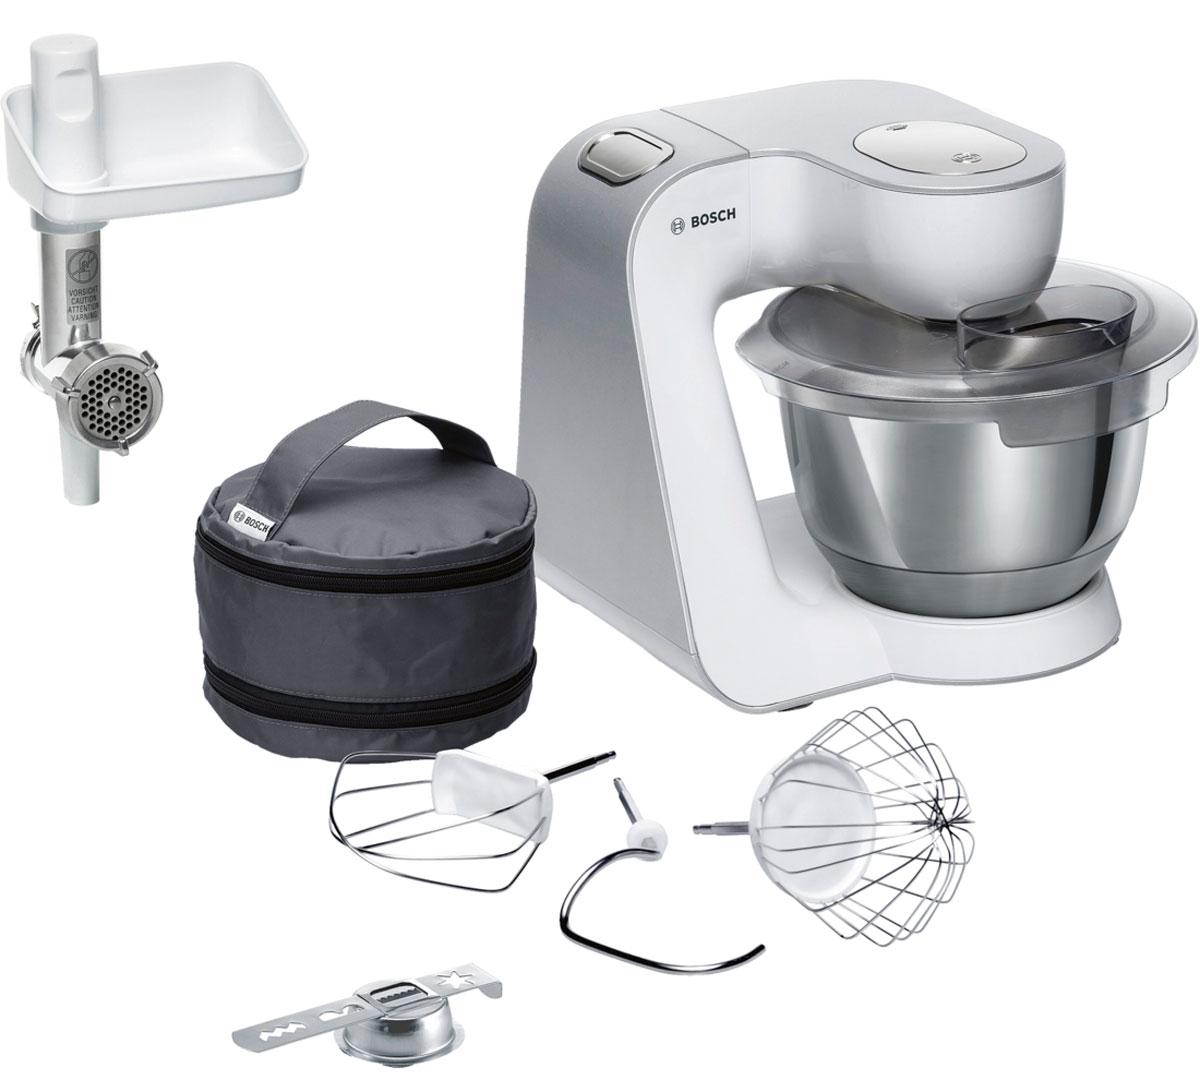 Bosch MUM58225, White кухонный комбайн